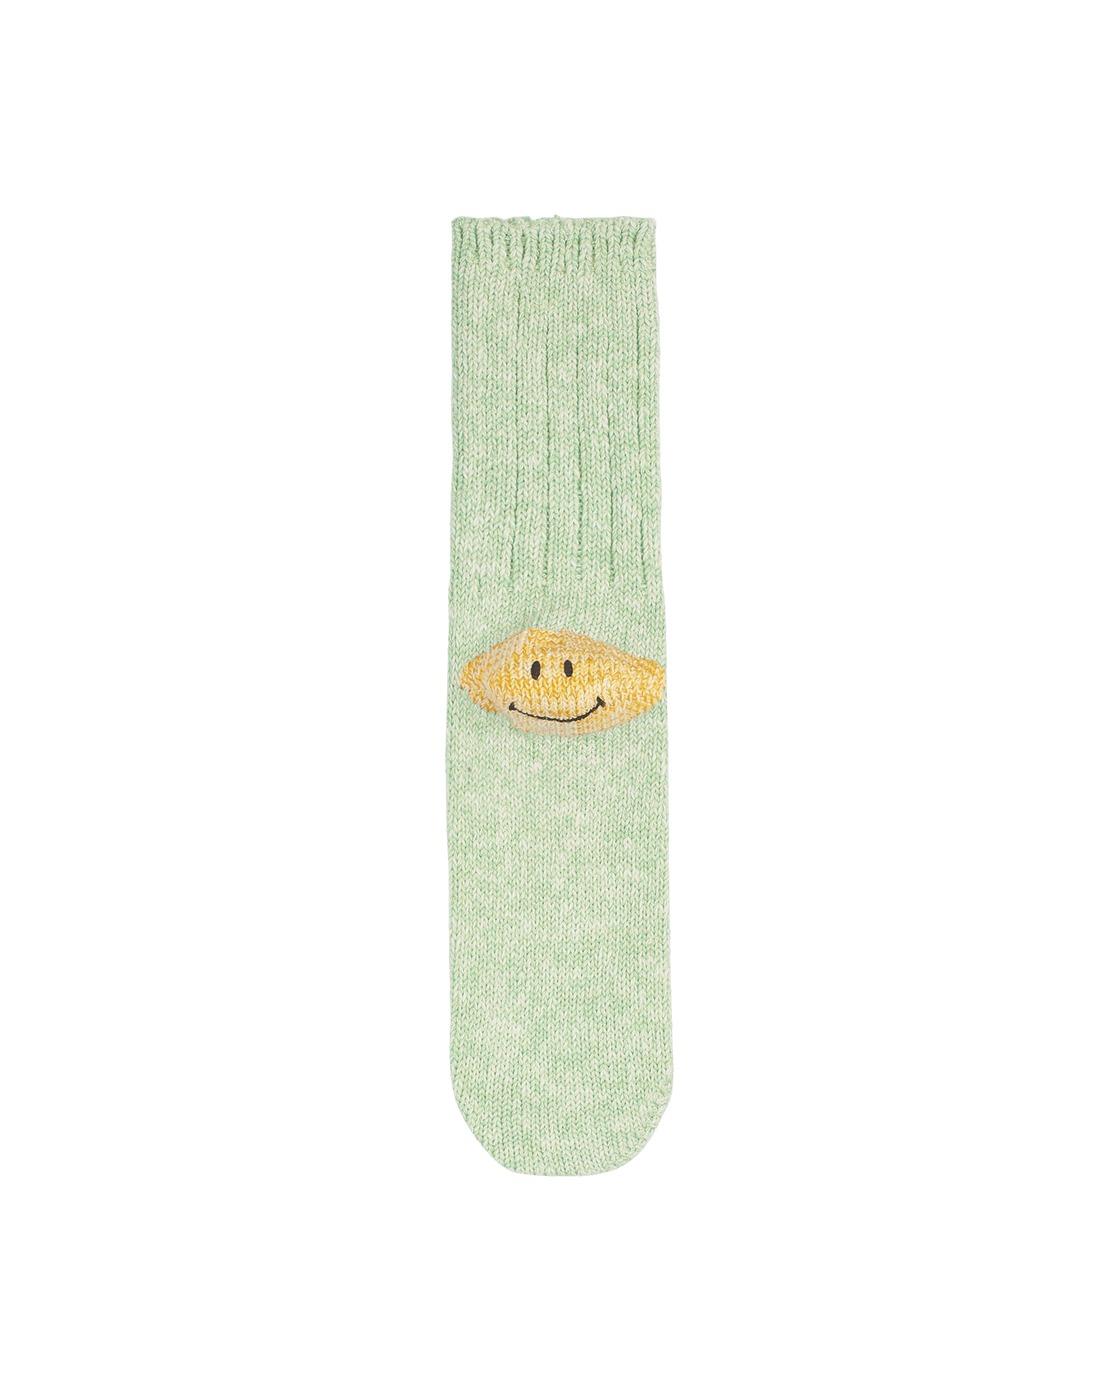 Kapital 56 Yarns 3x1 Rib Heel Smile Socks Green